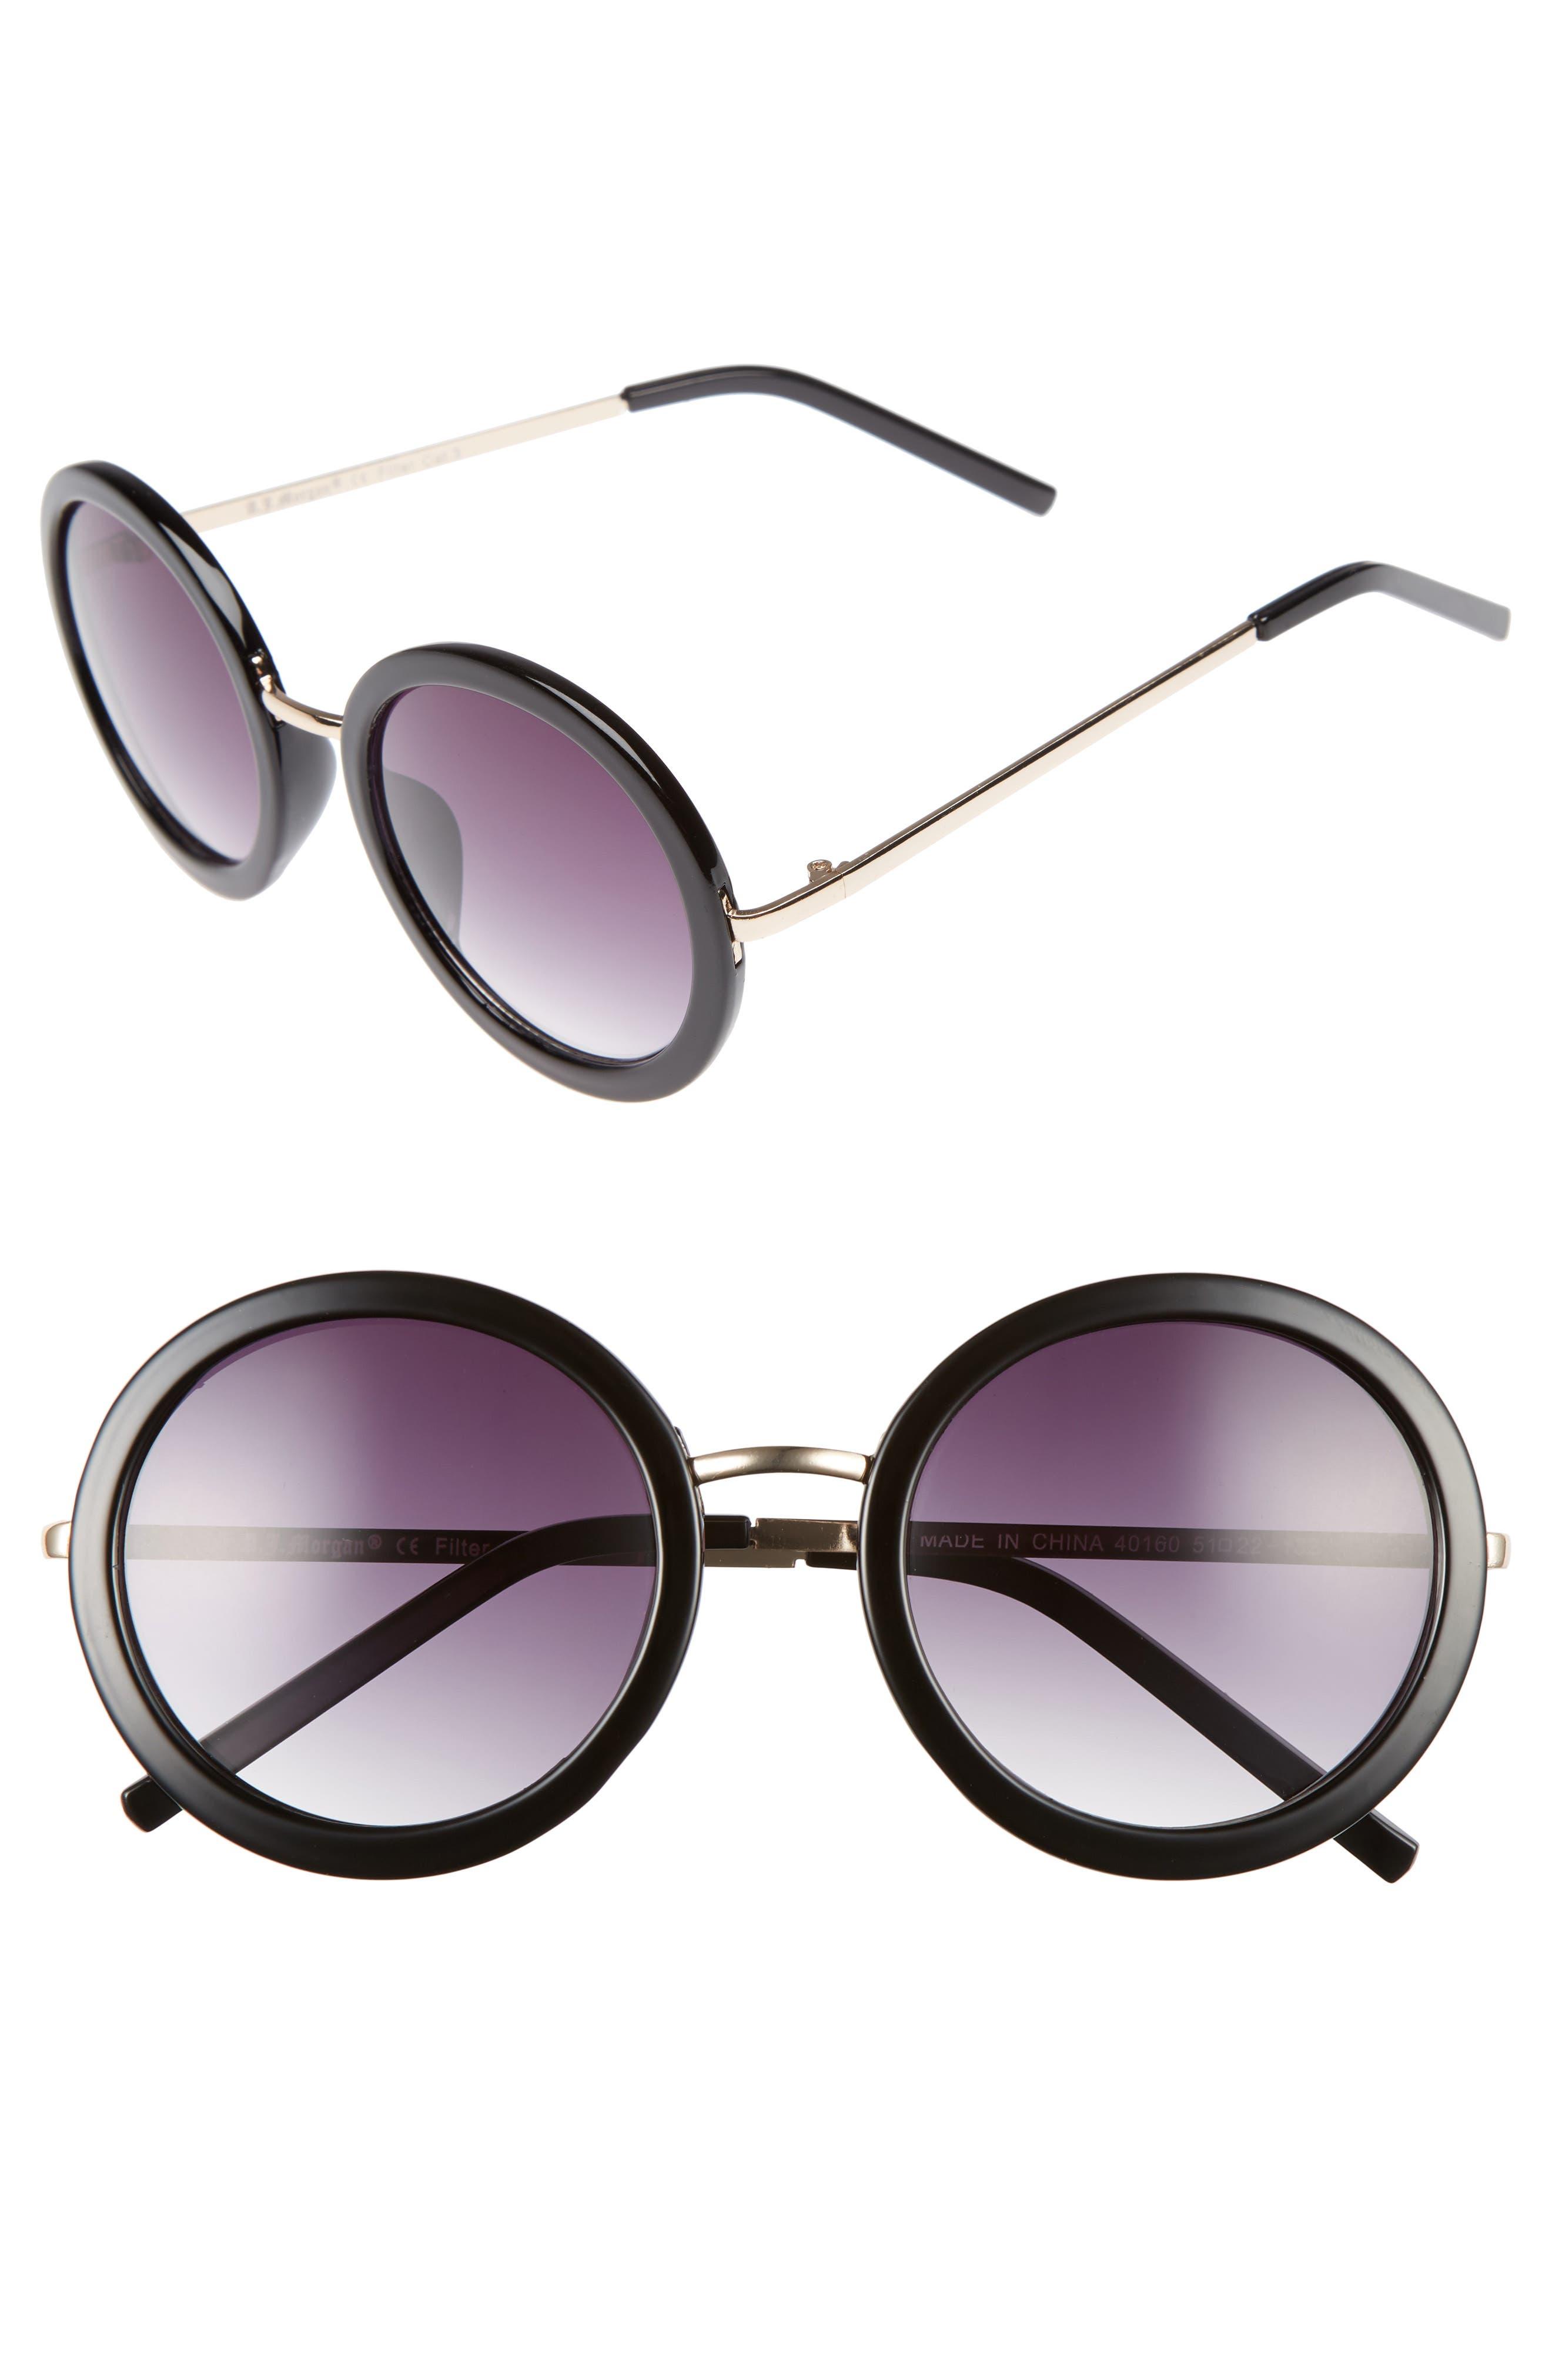 51mm Round Sunglasses,                             Main thumbnail 1, color,                             001